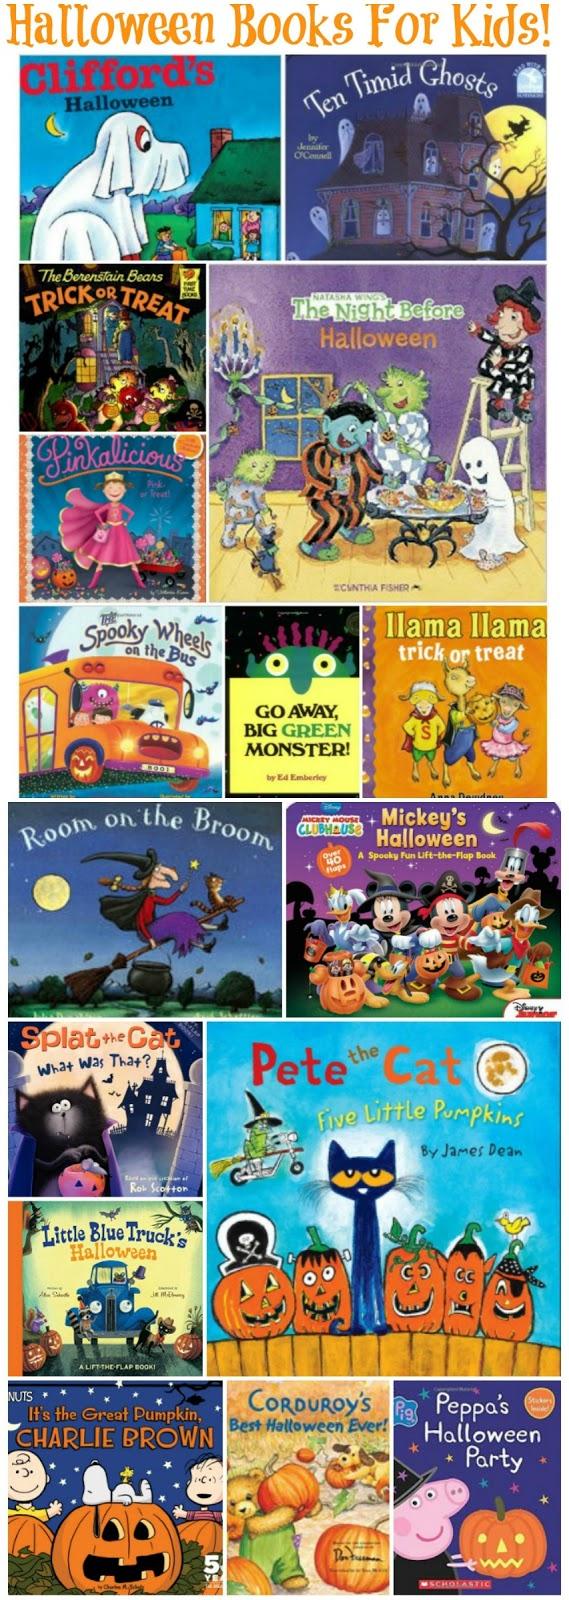 halloween books for kids, kids halloween books, kids books, kids holiday books, #kidsbooks #halloween